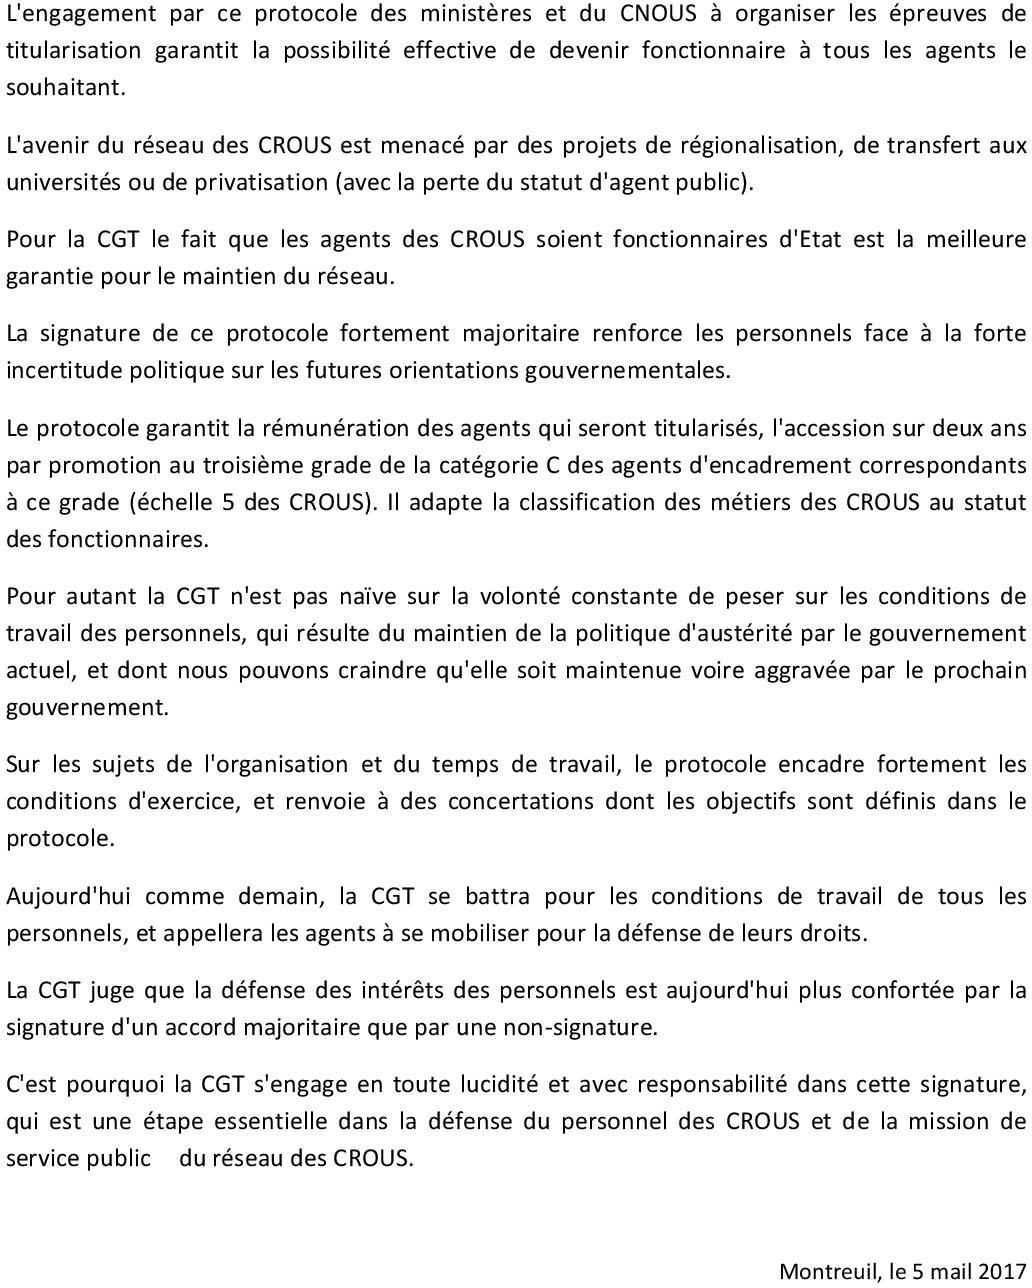 Communiqu presse protocole2